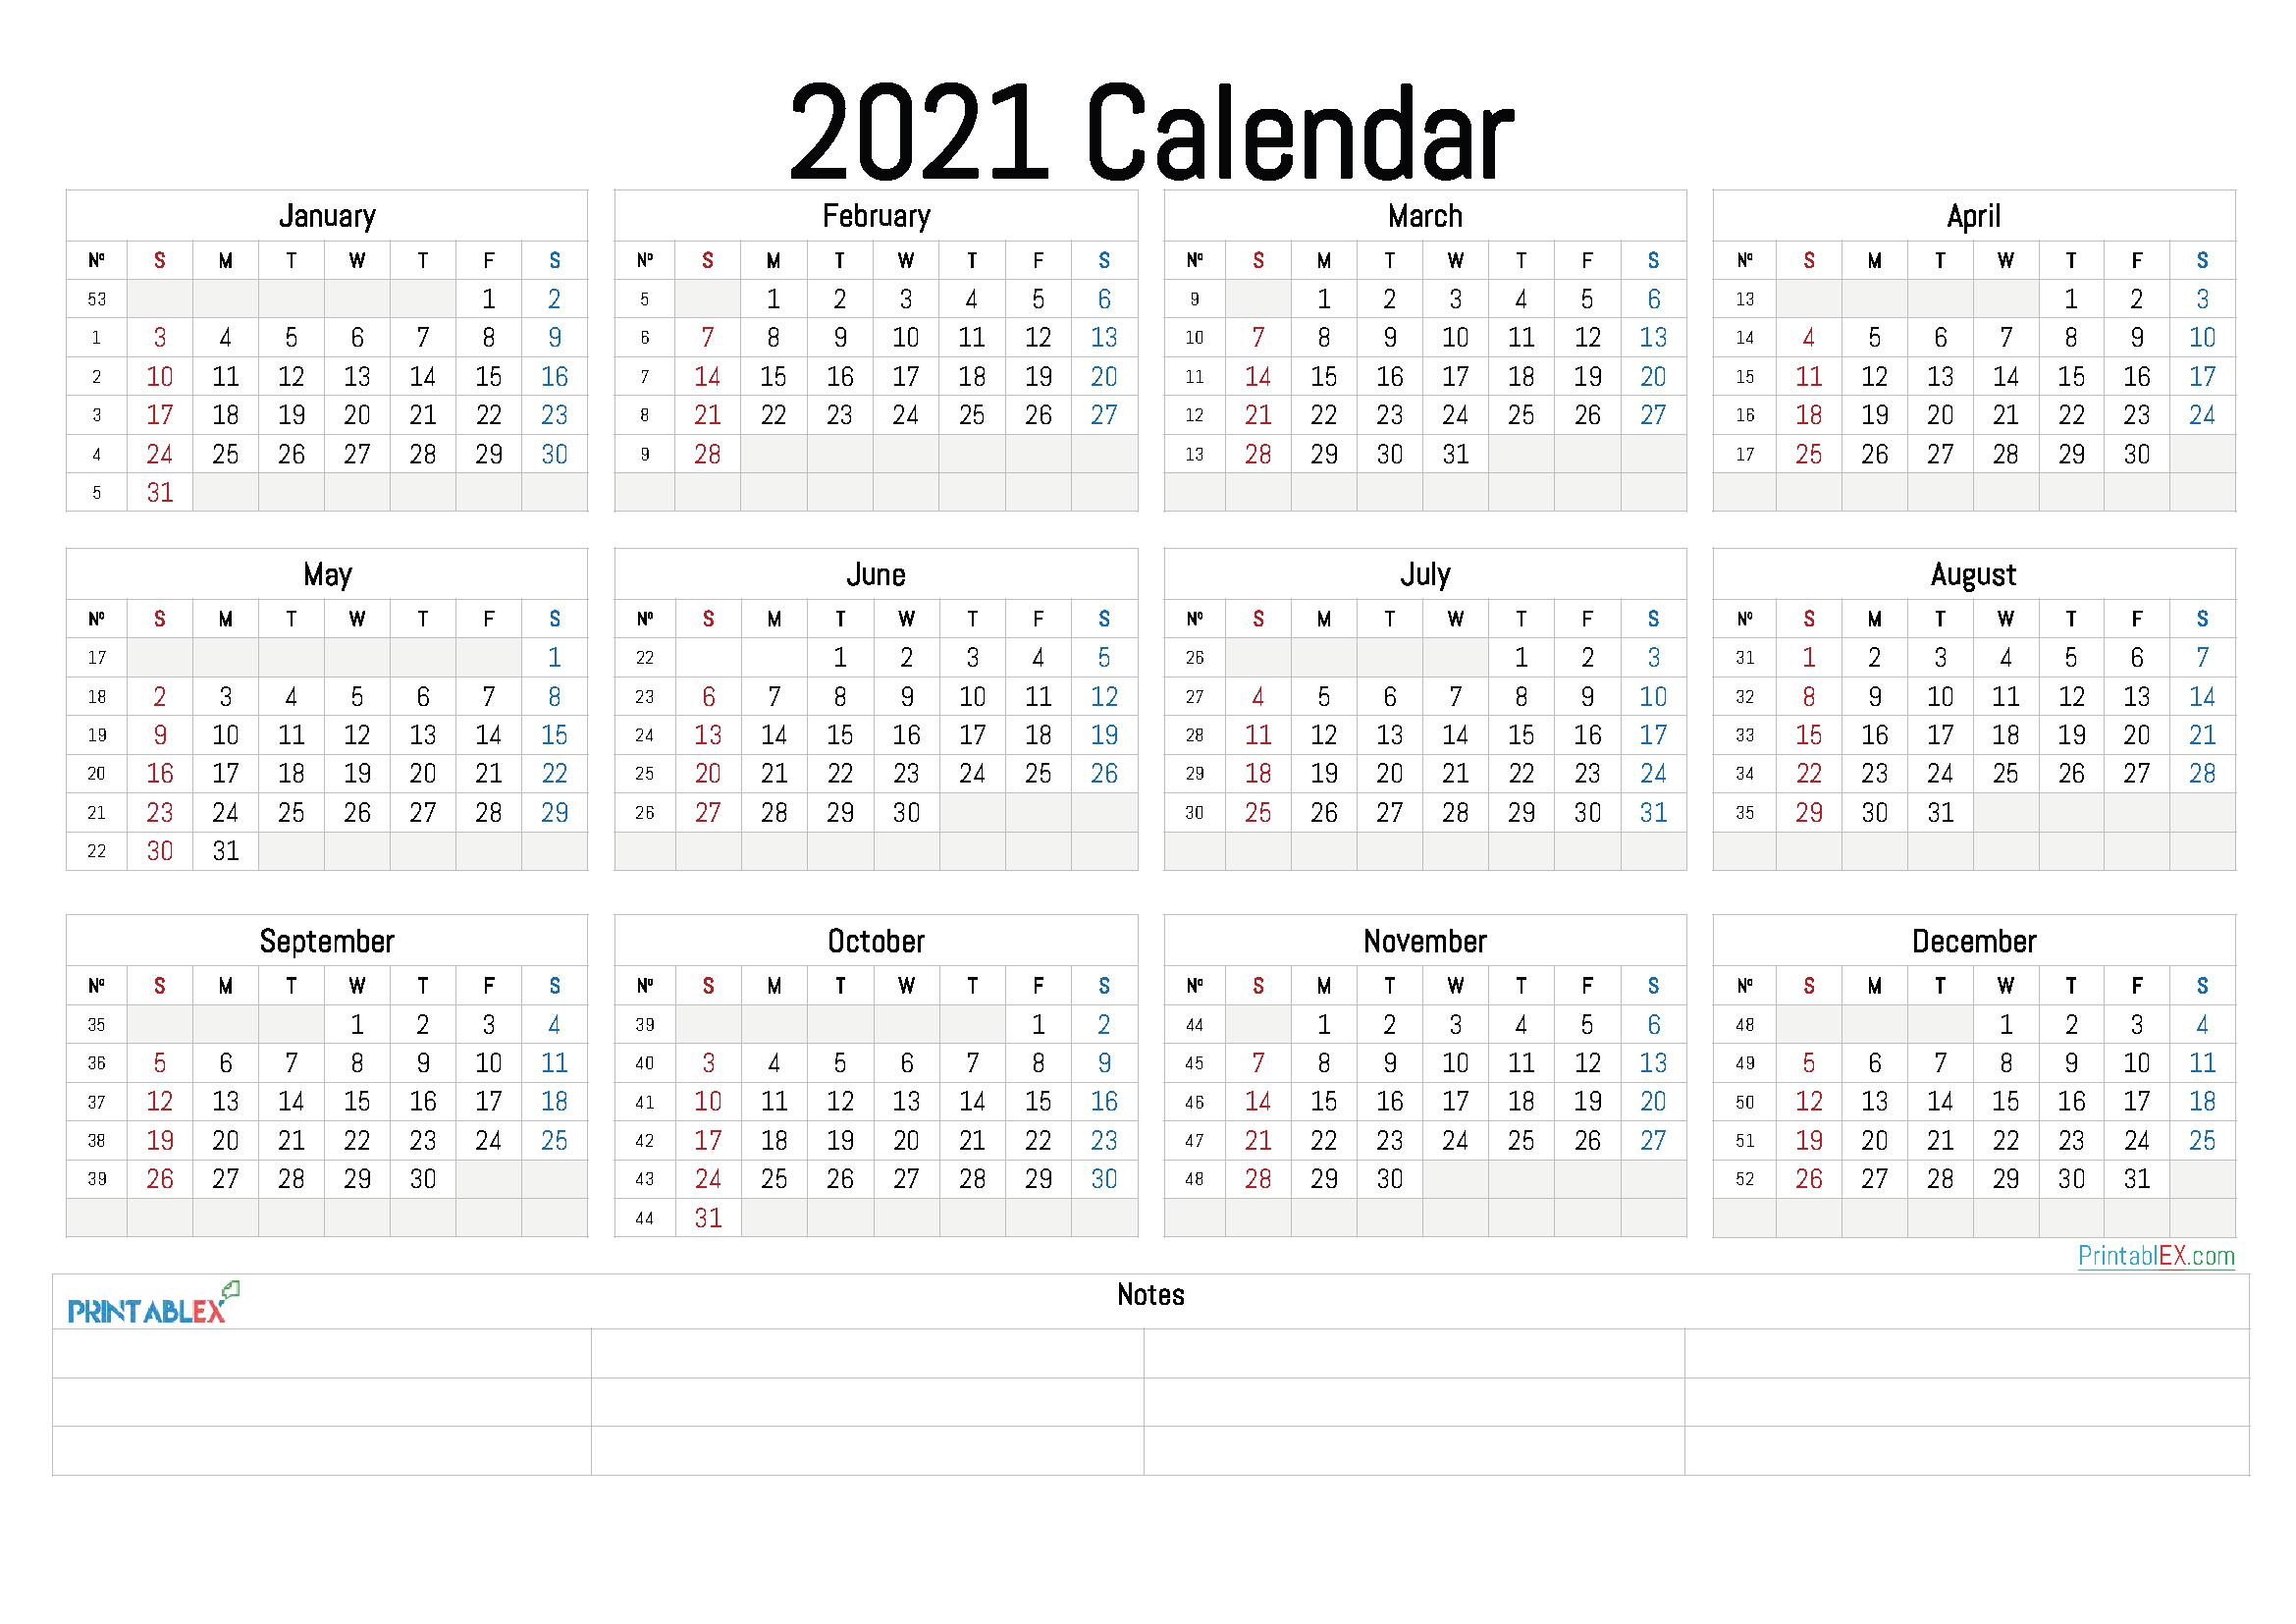 2021 Annual Calendar Printable Free Printable 2020 1